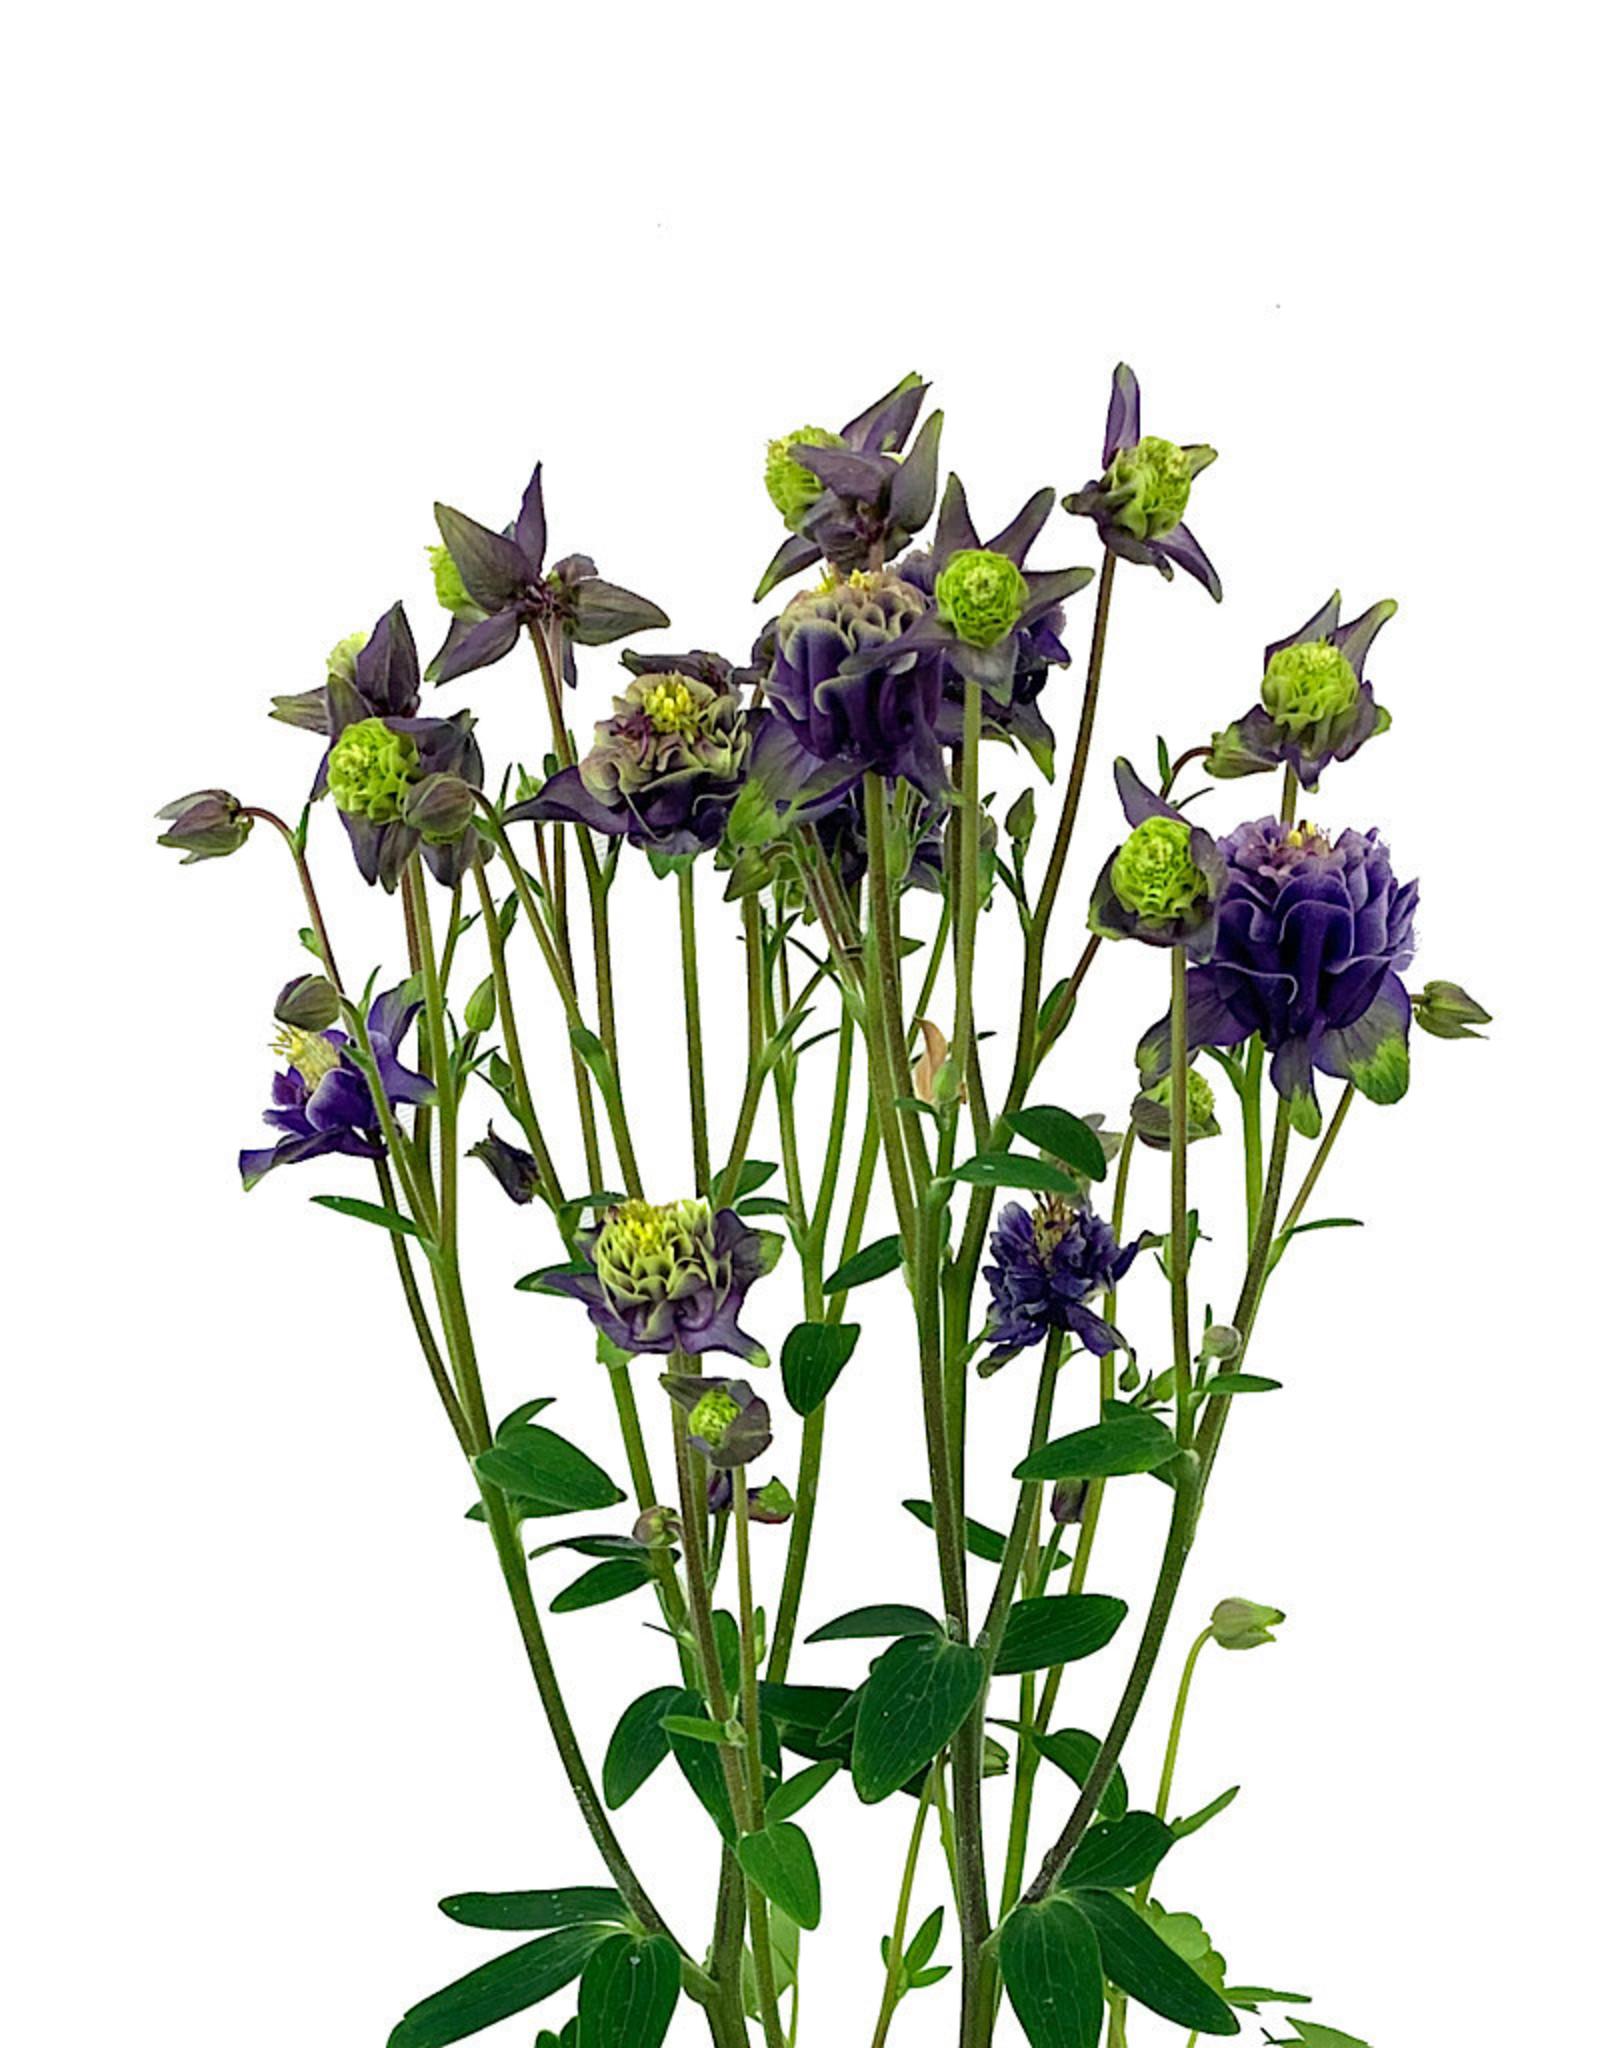 Aquilegia caerulea 'Winky Double Dark Blue and White' Quart